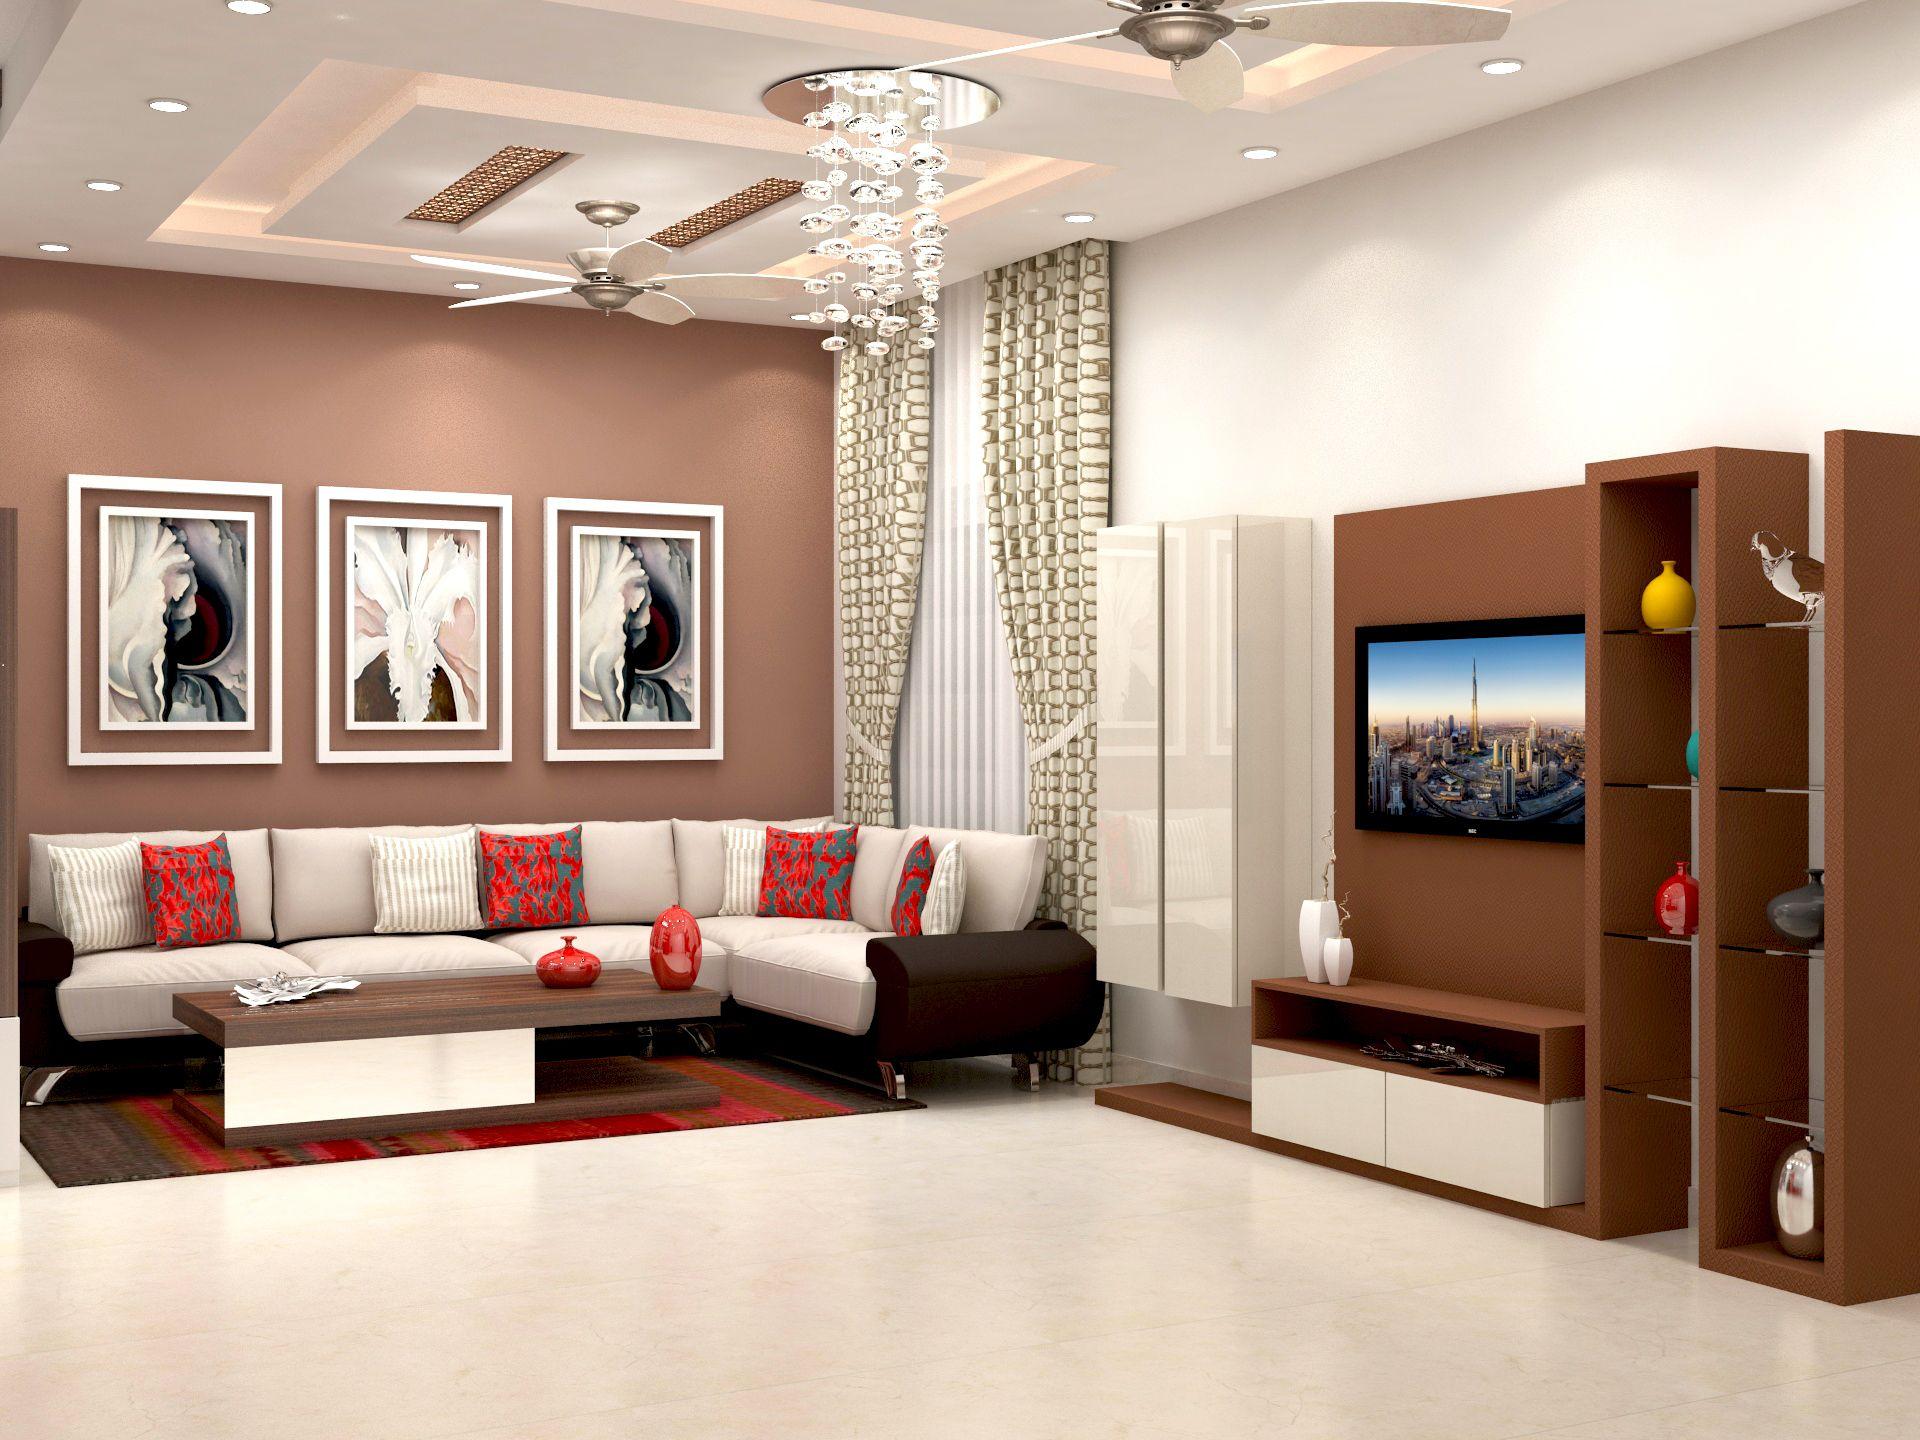 Interiordesigners Interiors Noida Homerenovation Dreamhome